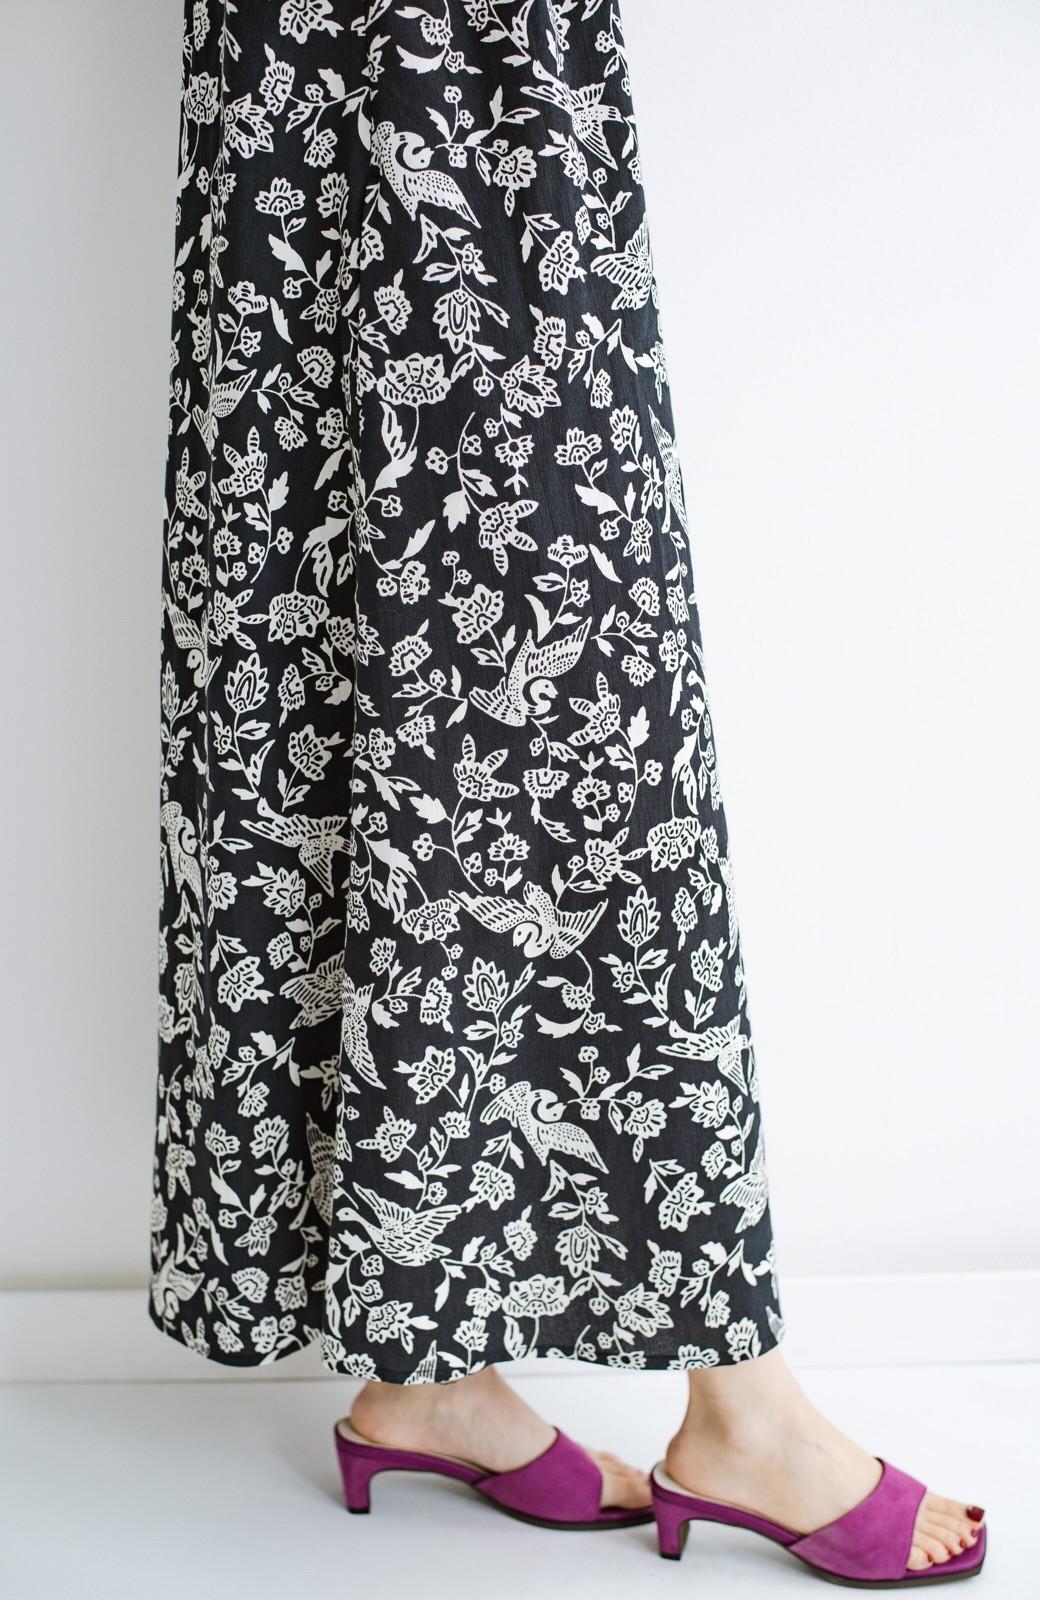 haco! 京都の浴衣屋さんと作った浴衣生地の羽織ってもかわいいロングワンピース <ブラック系その他>の商品写真8